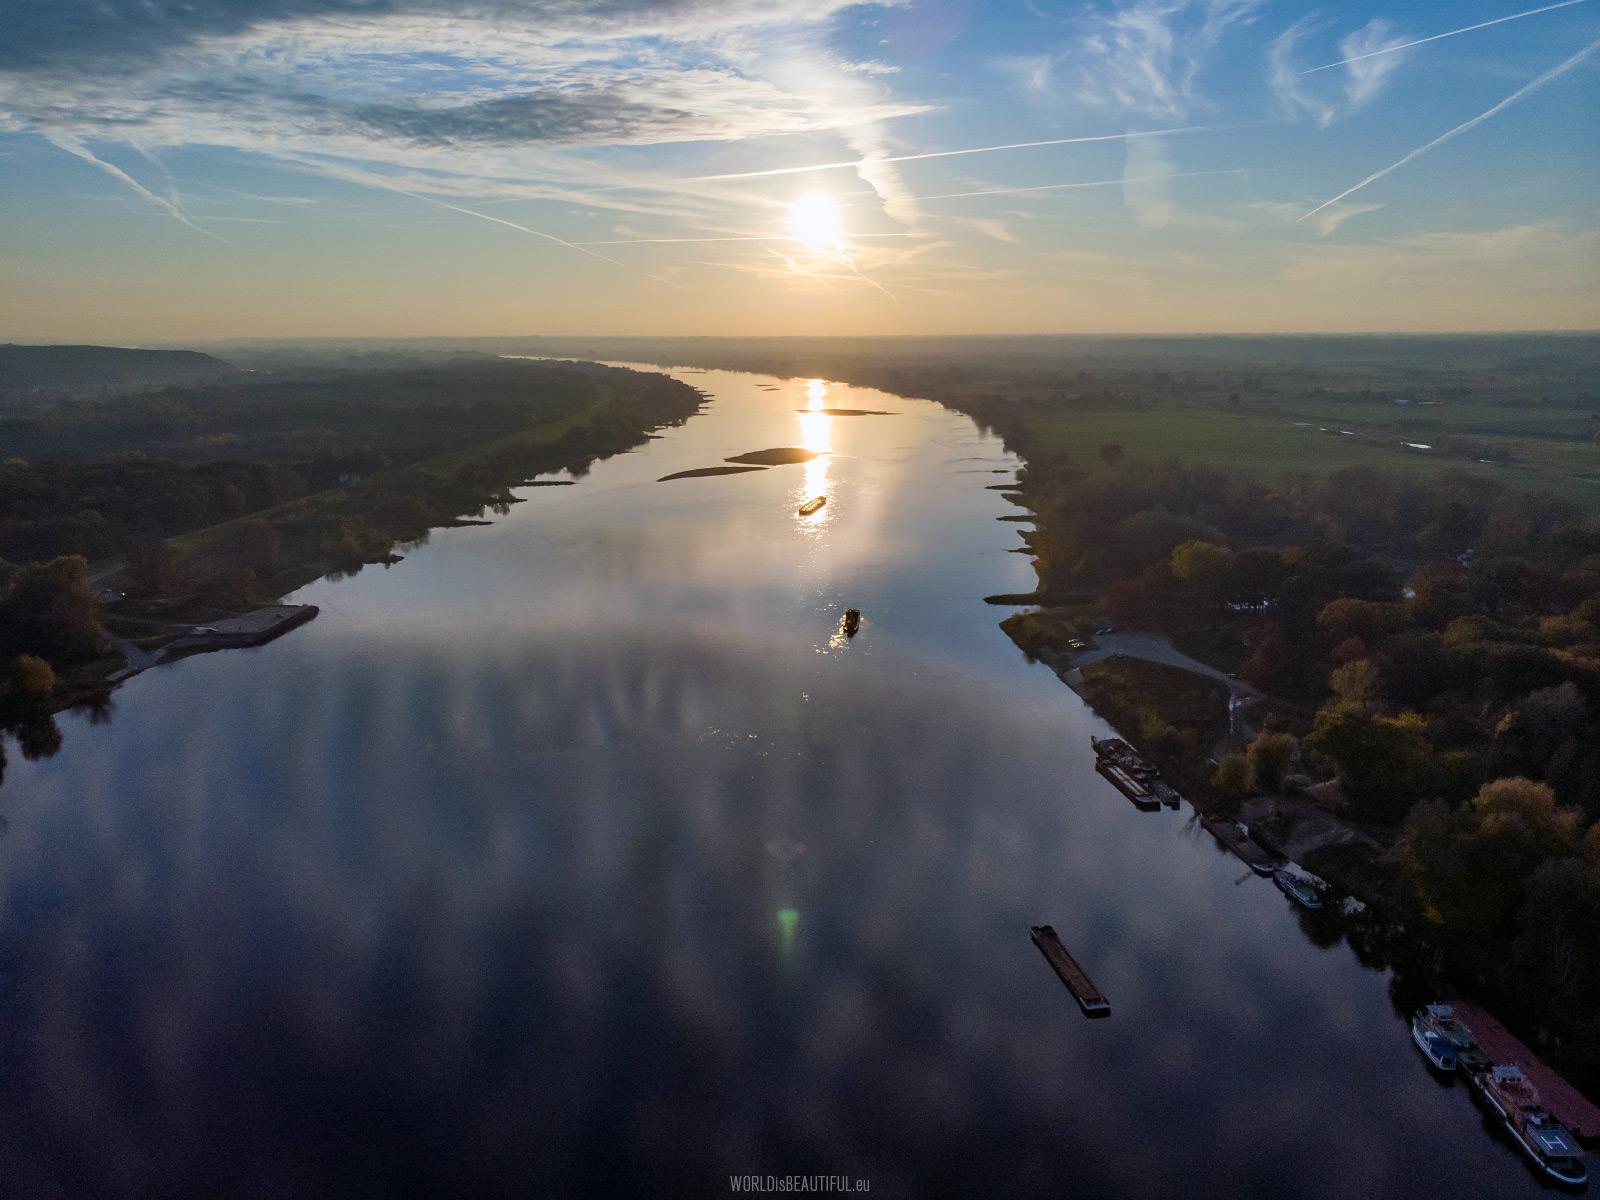 Sunset on the Vistula River